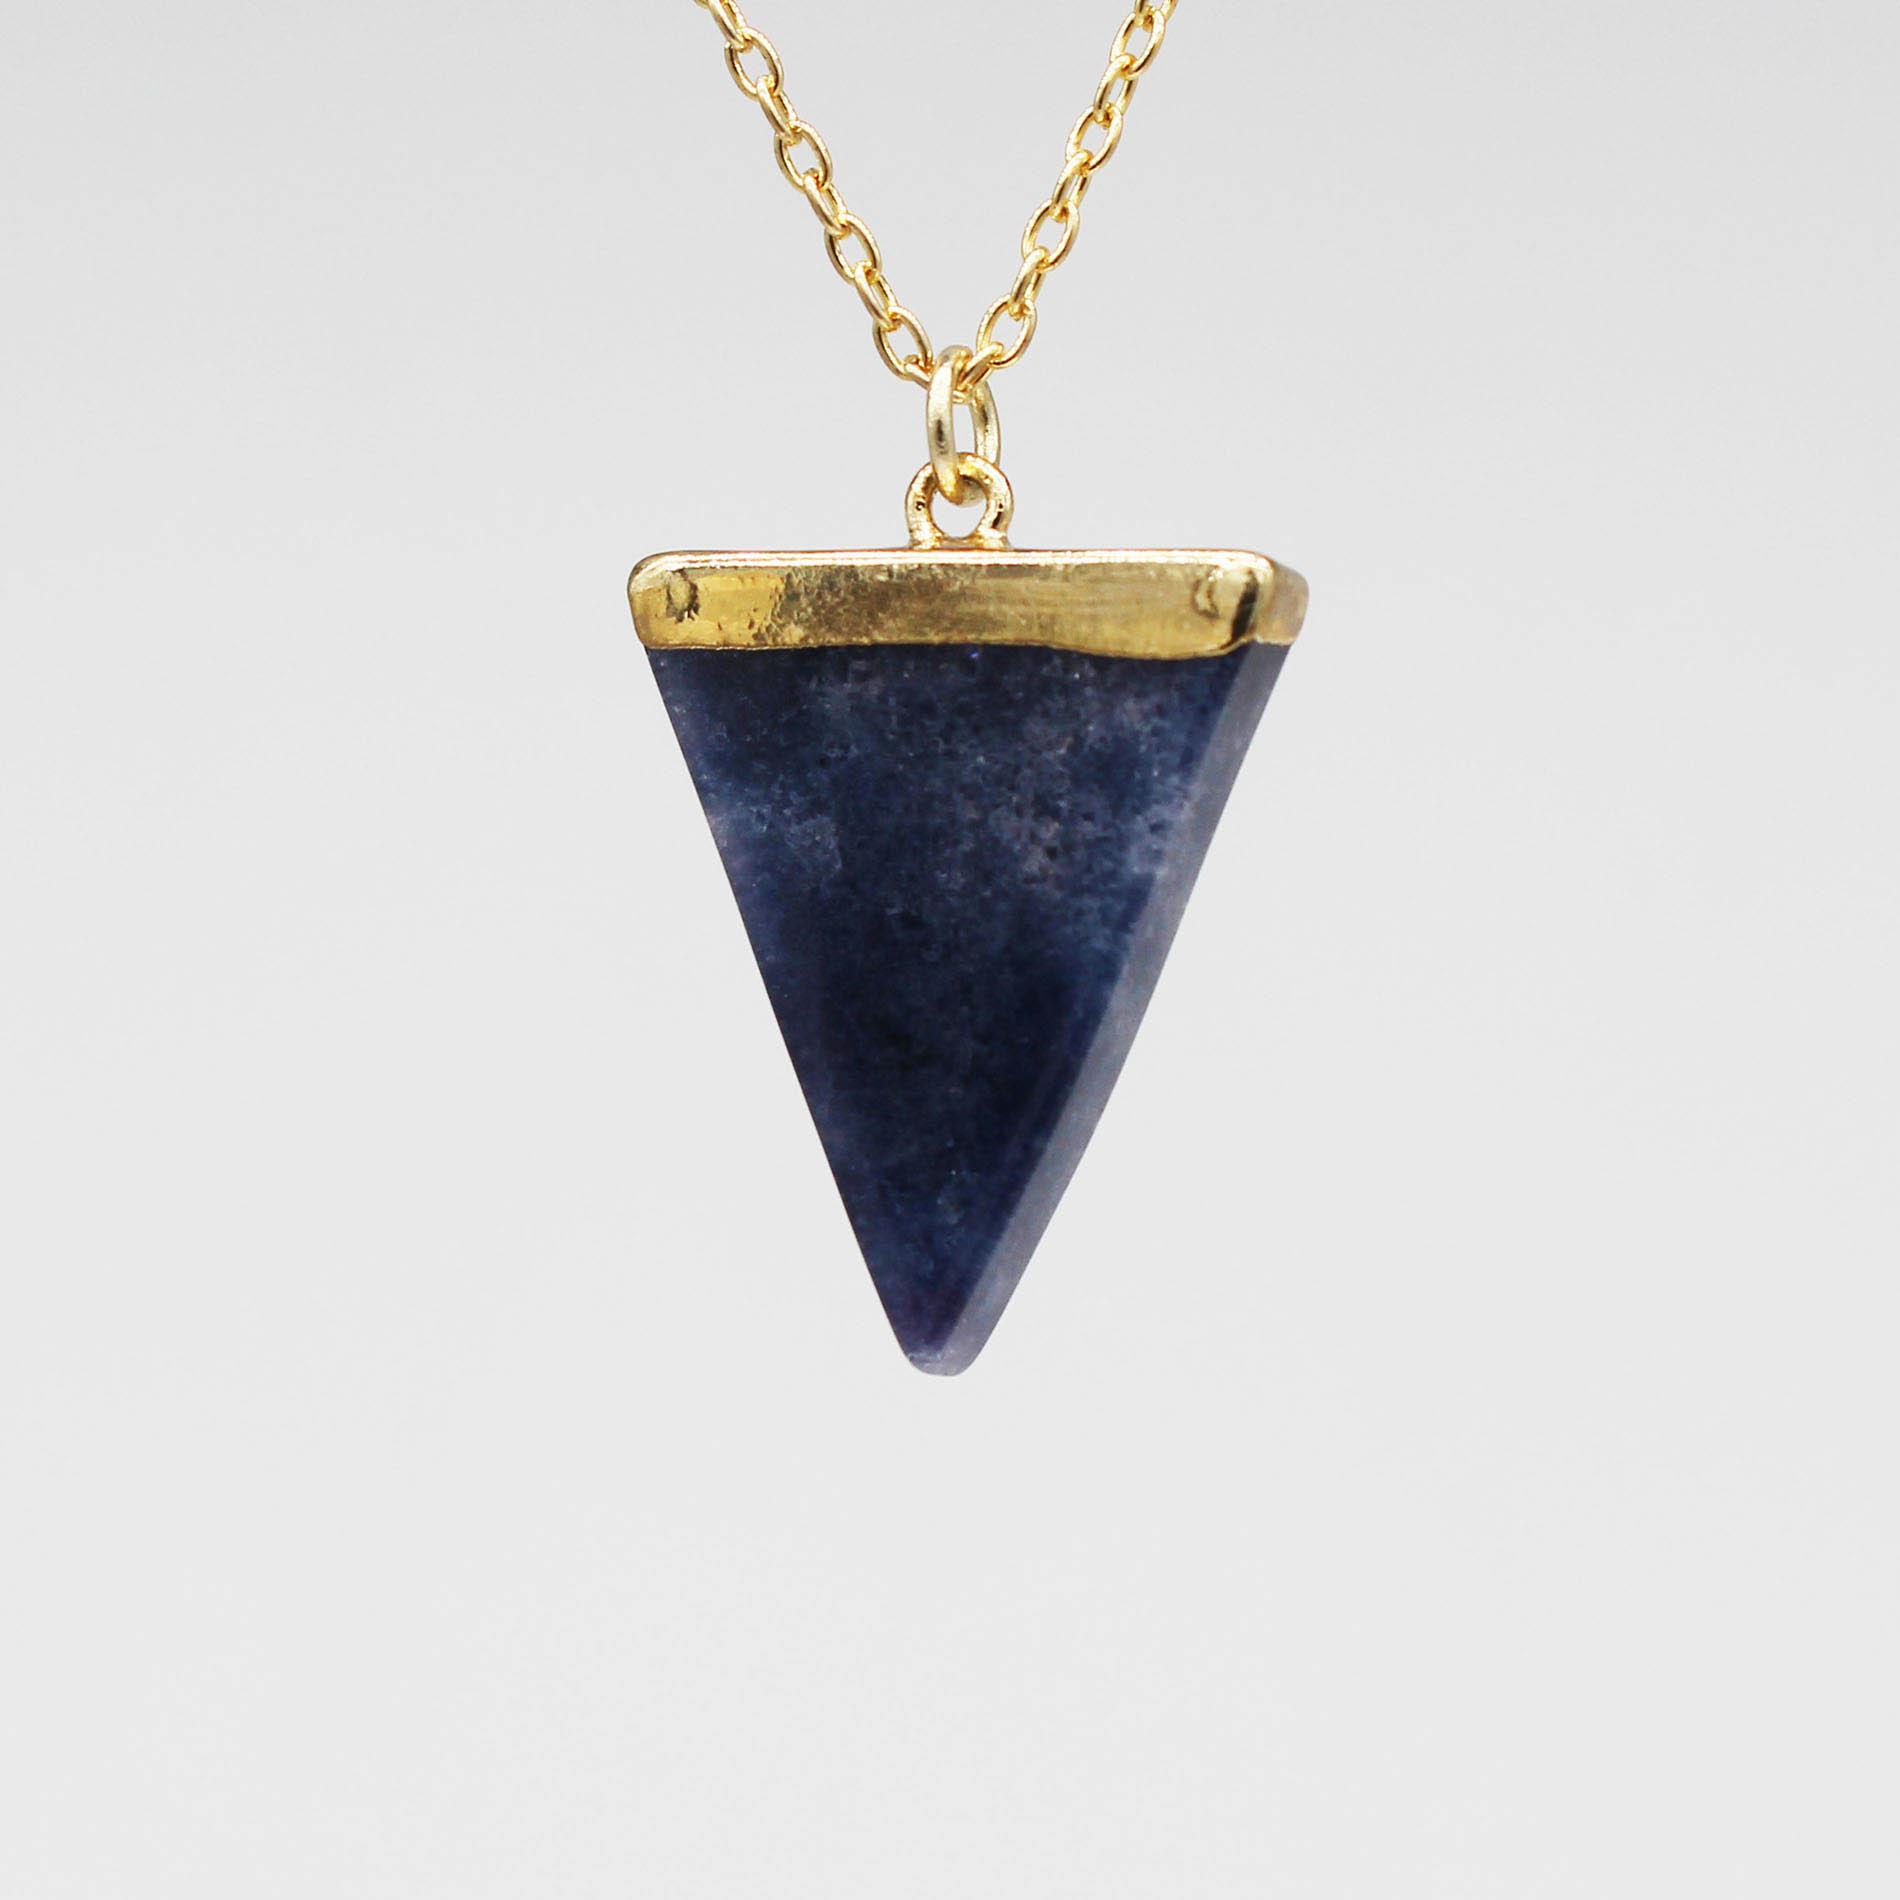 Holistic Affinity Gemstones